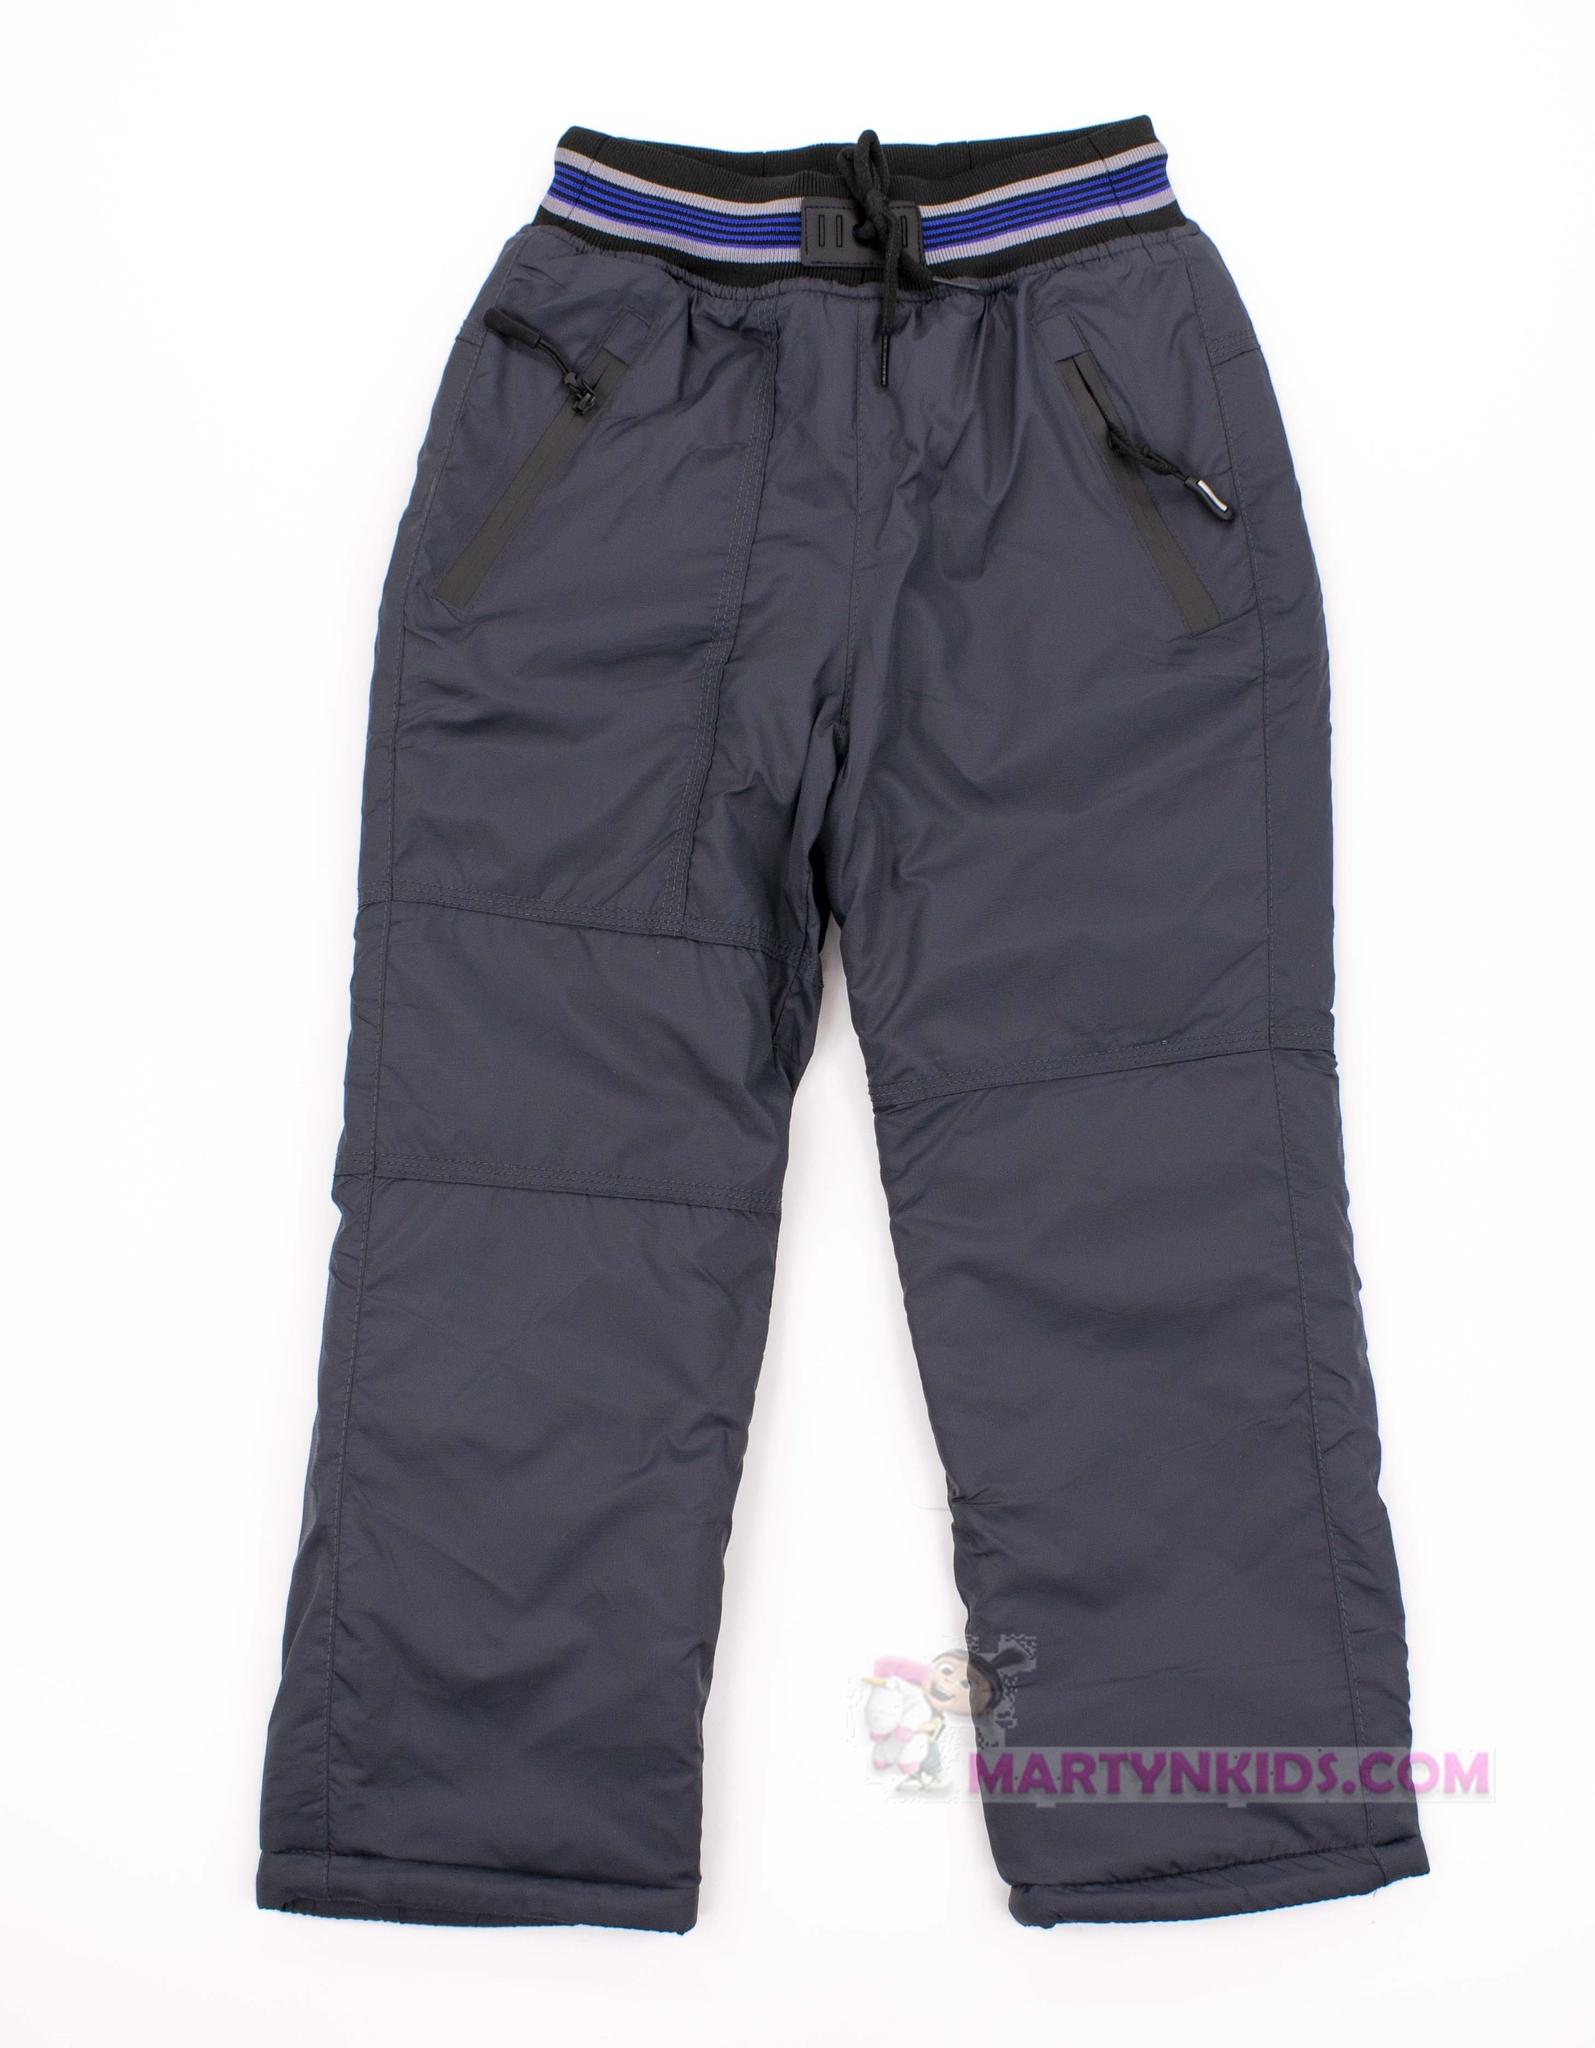 3870 термолайт штаны  Emur 099